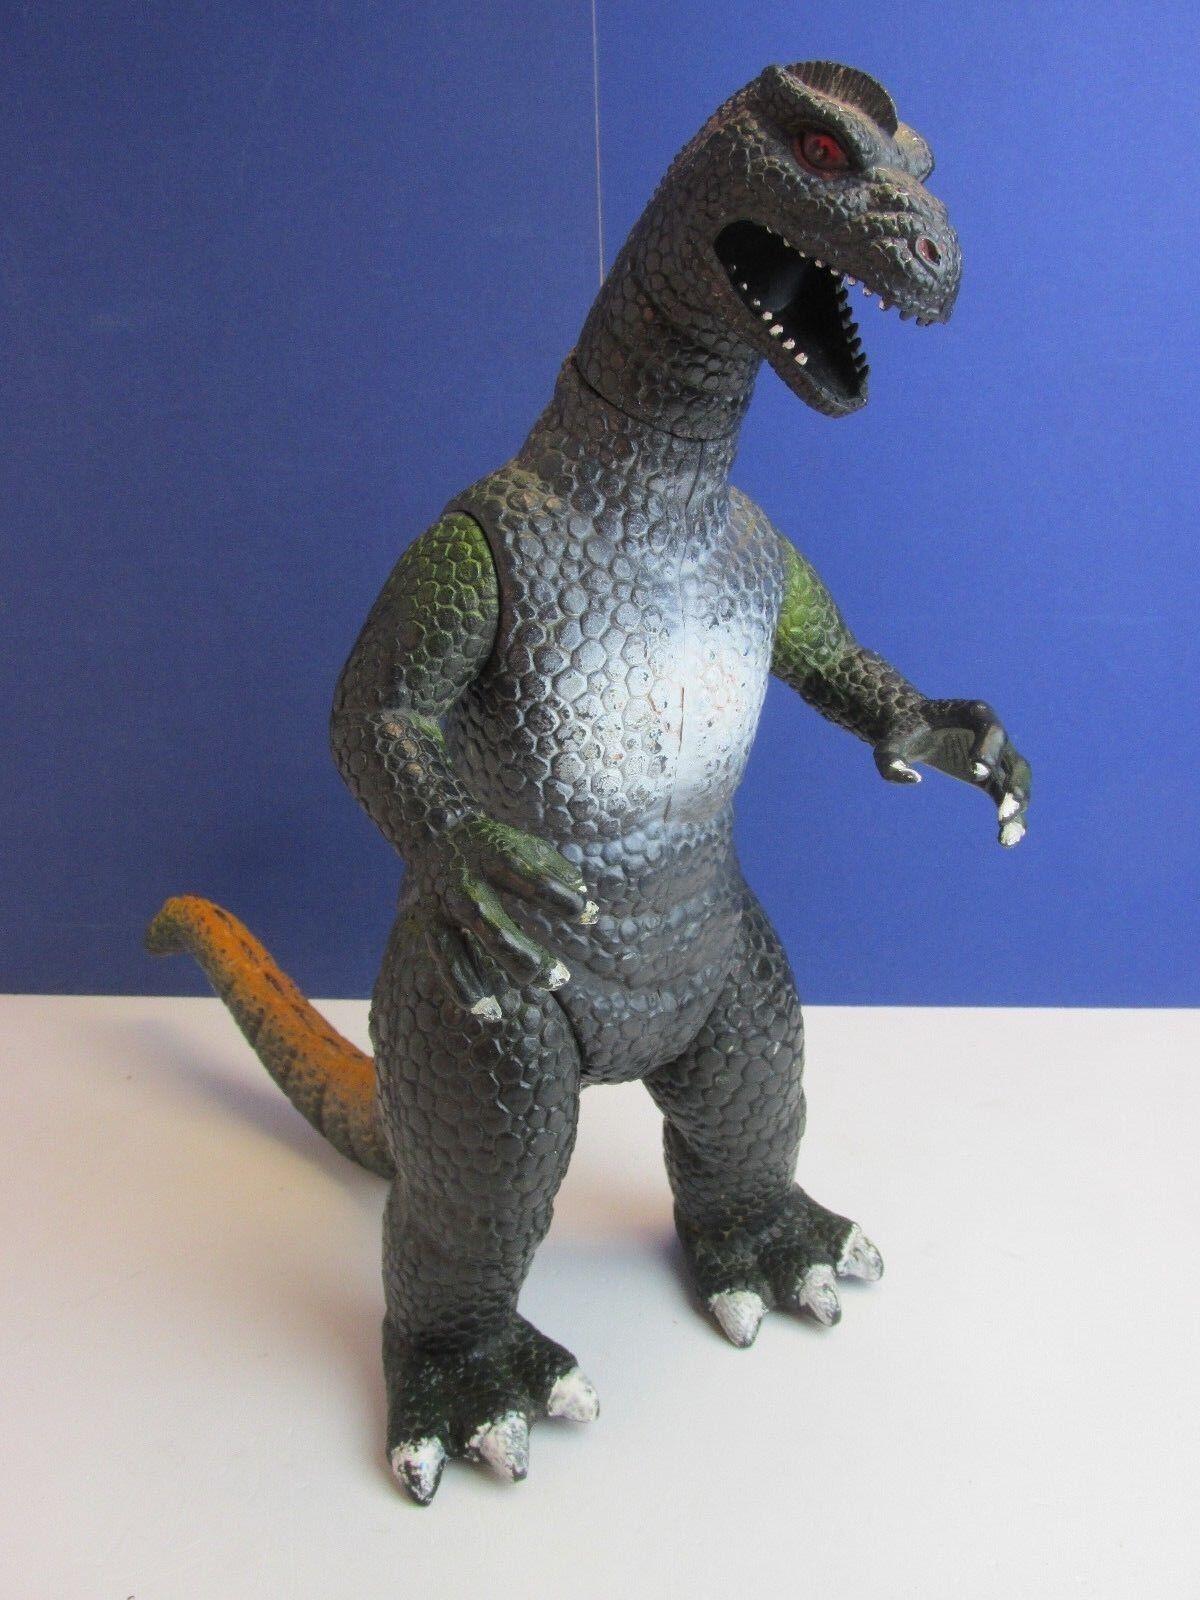 Large VINTAGE rare GODZILLA 15  ACTION FIGURE DOR MEI 1986 dinosaur lizard 83R